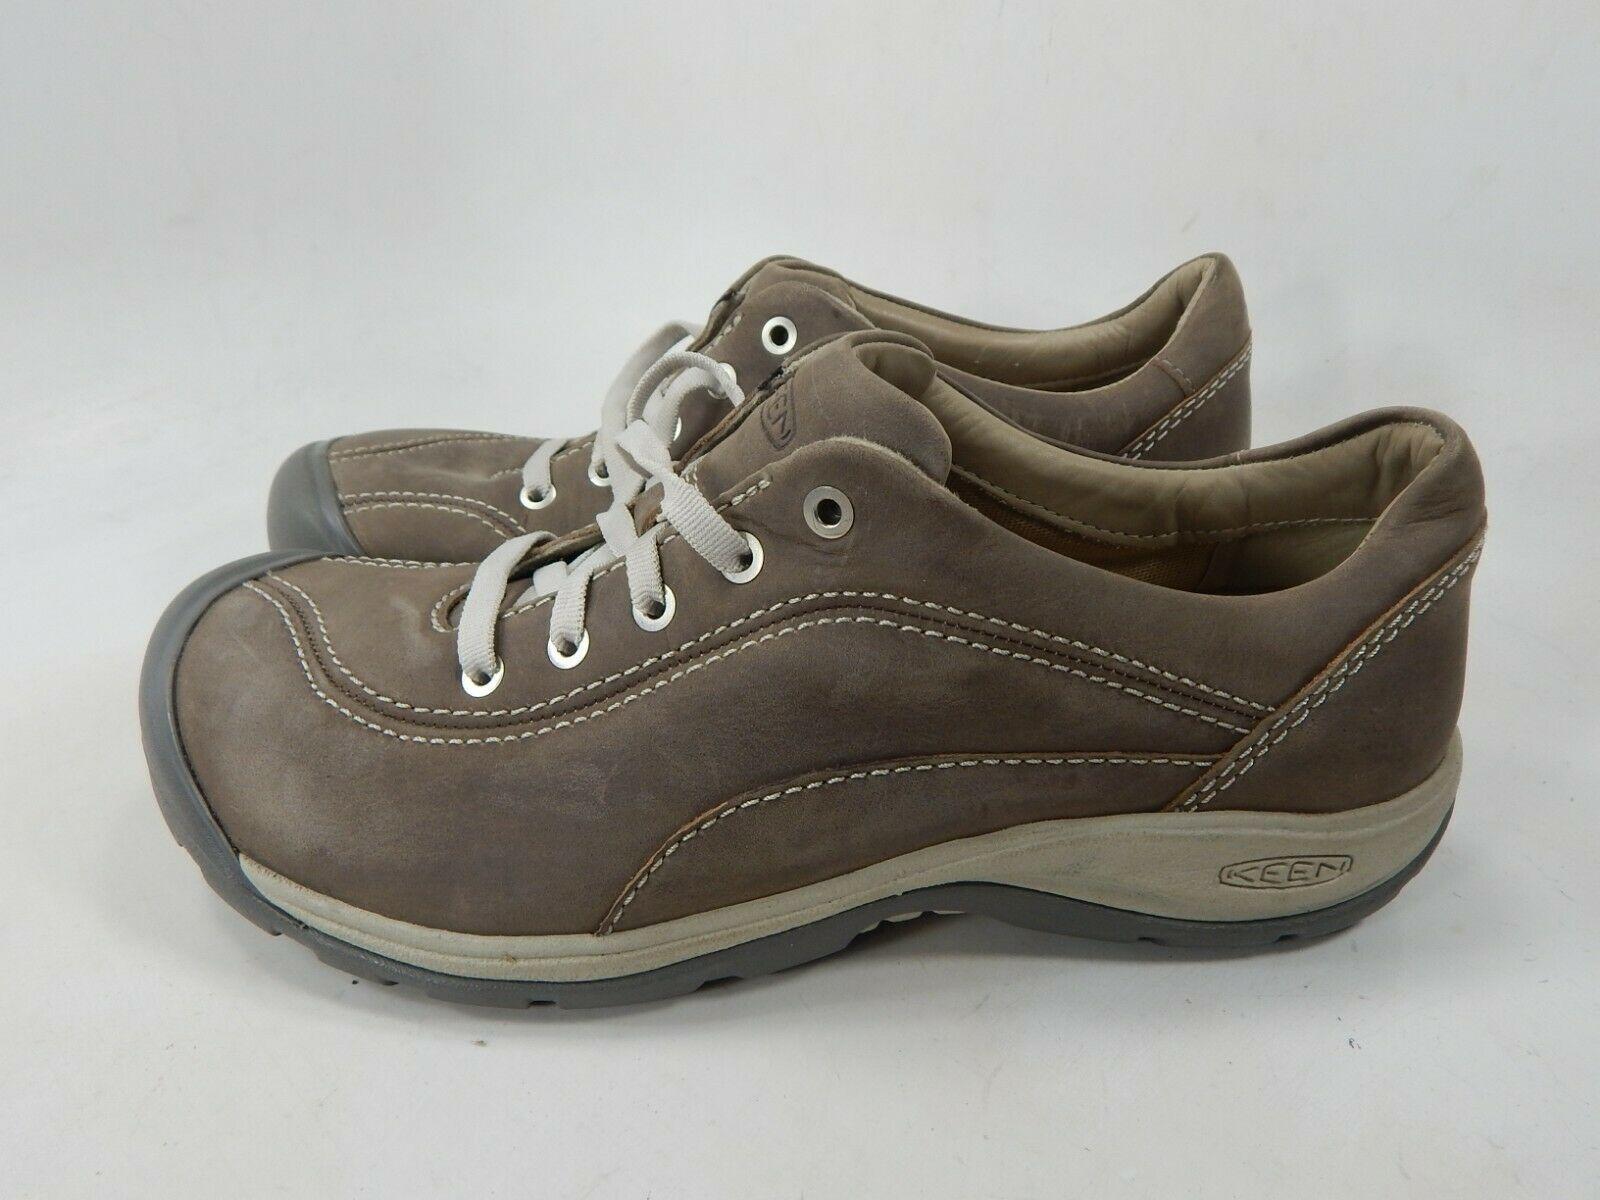 Keen Presidio II Misura 7 M (B) Eu 37.5 Donna Casual Oxford Shoes Paloma 1018316 image 4